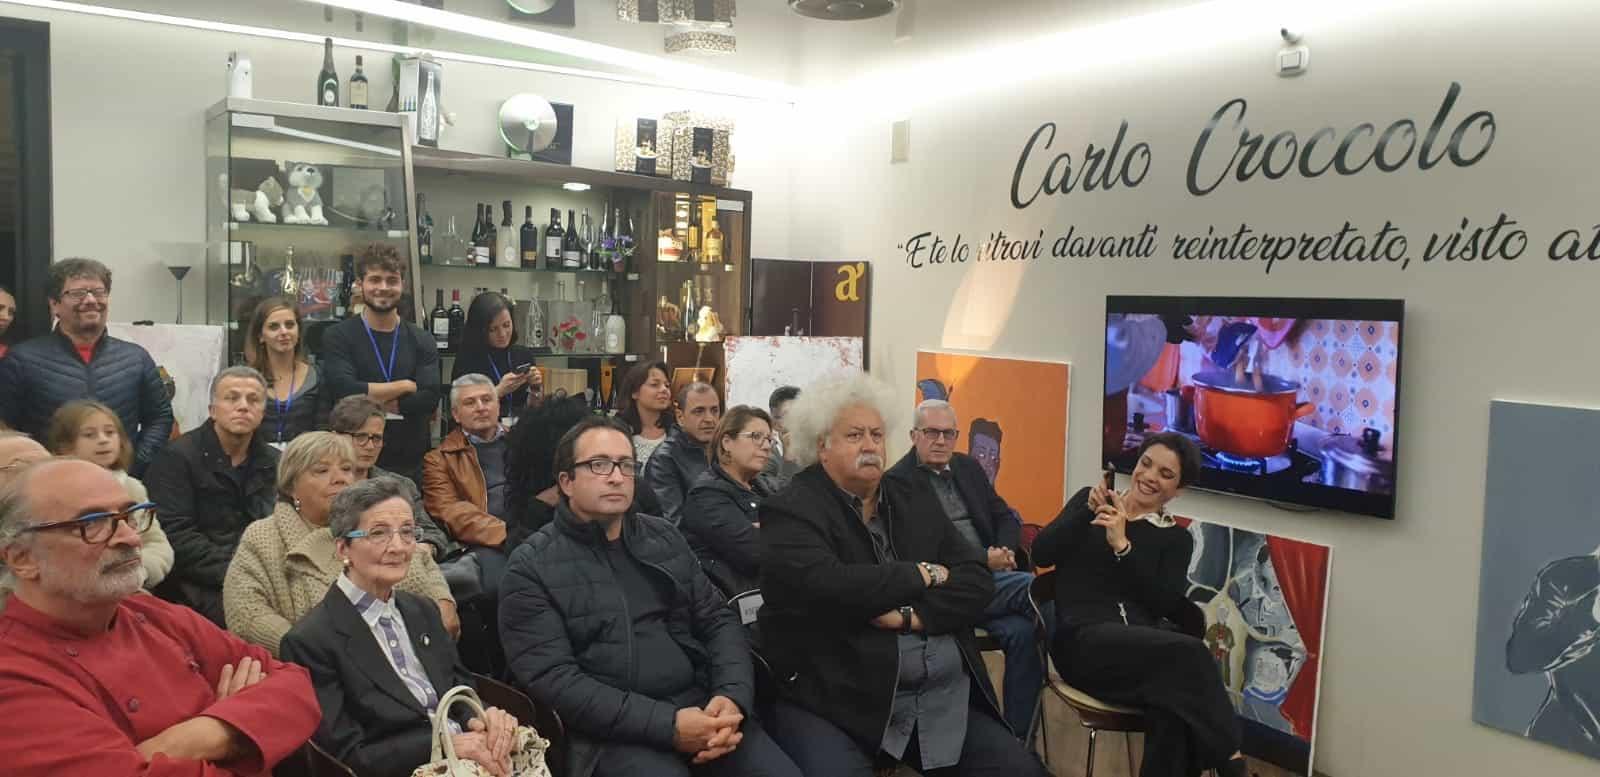 informareonline-carlo-croccolo-4